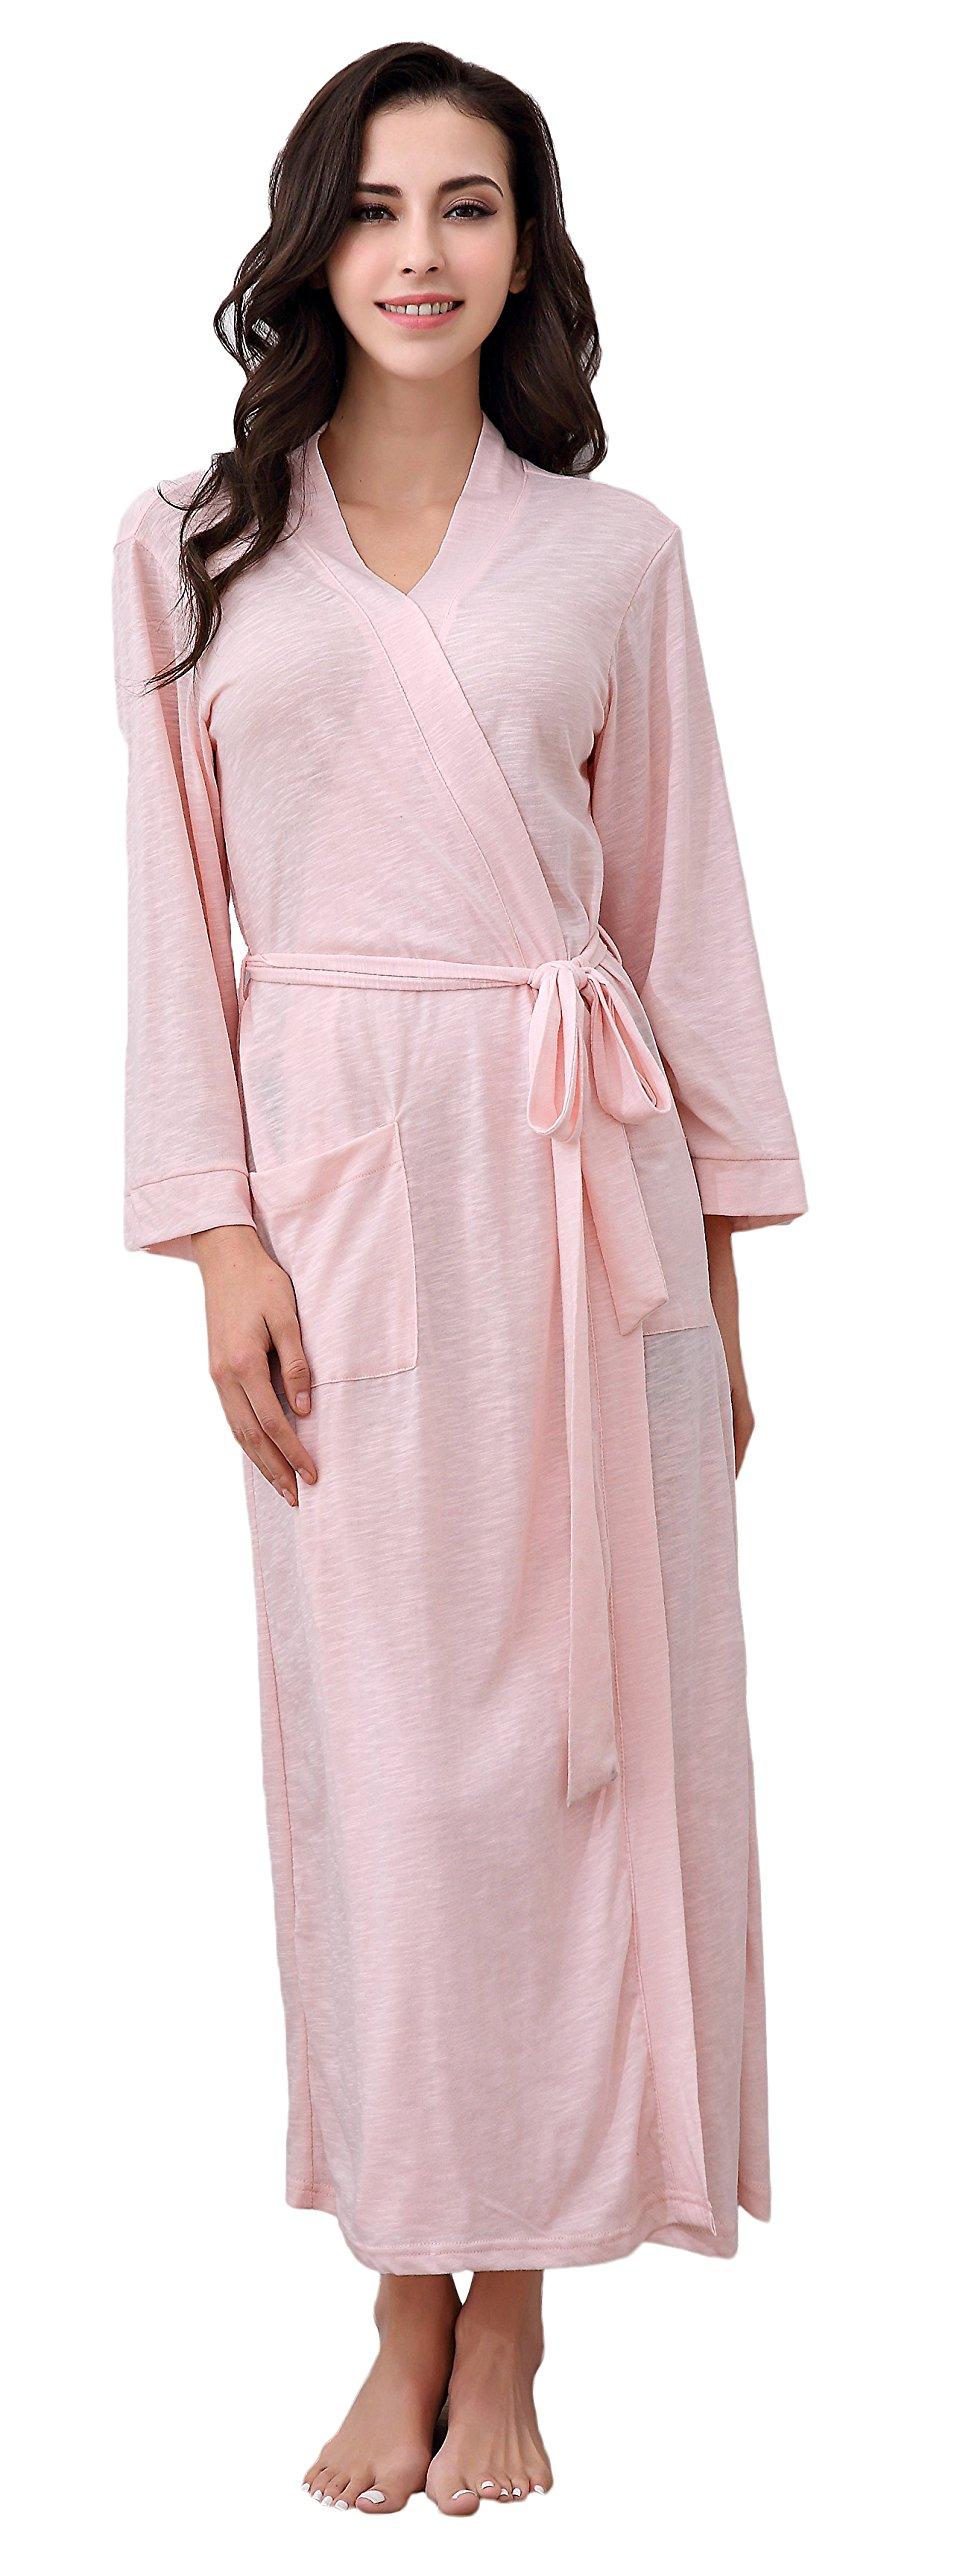 Richie House Women's Long Style Bathrobe Robe RHW2824-B-L